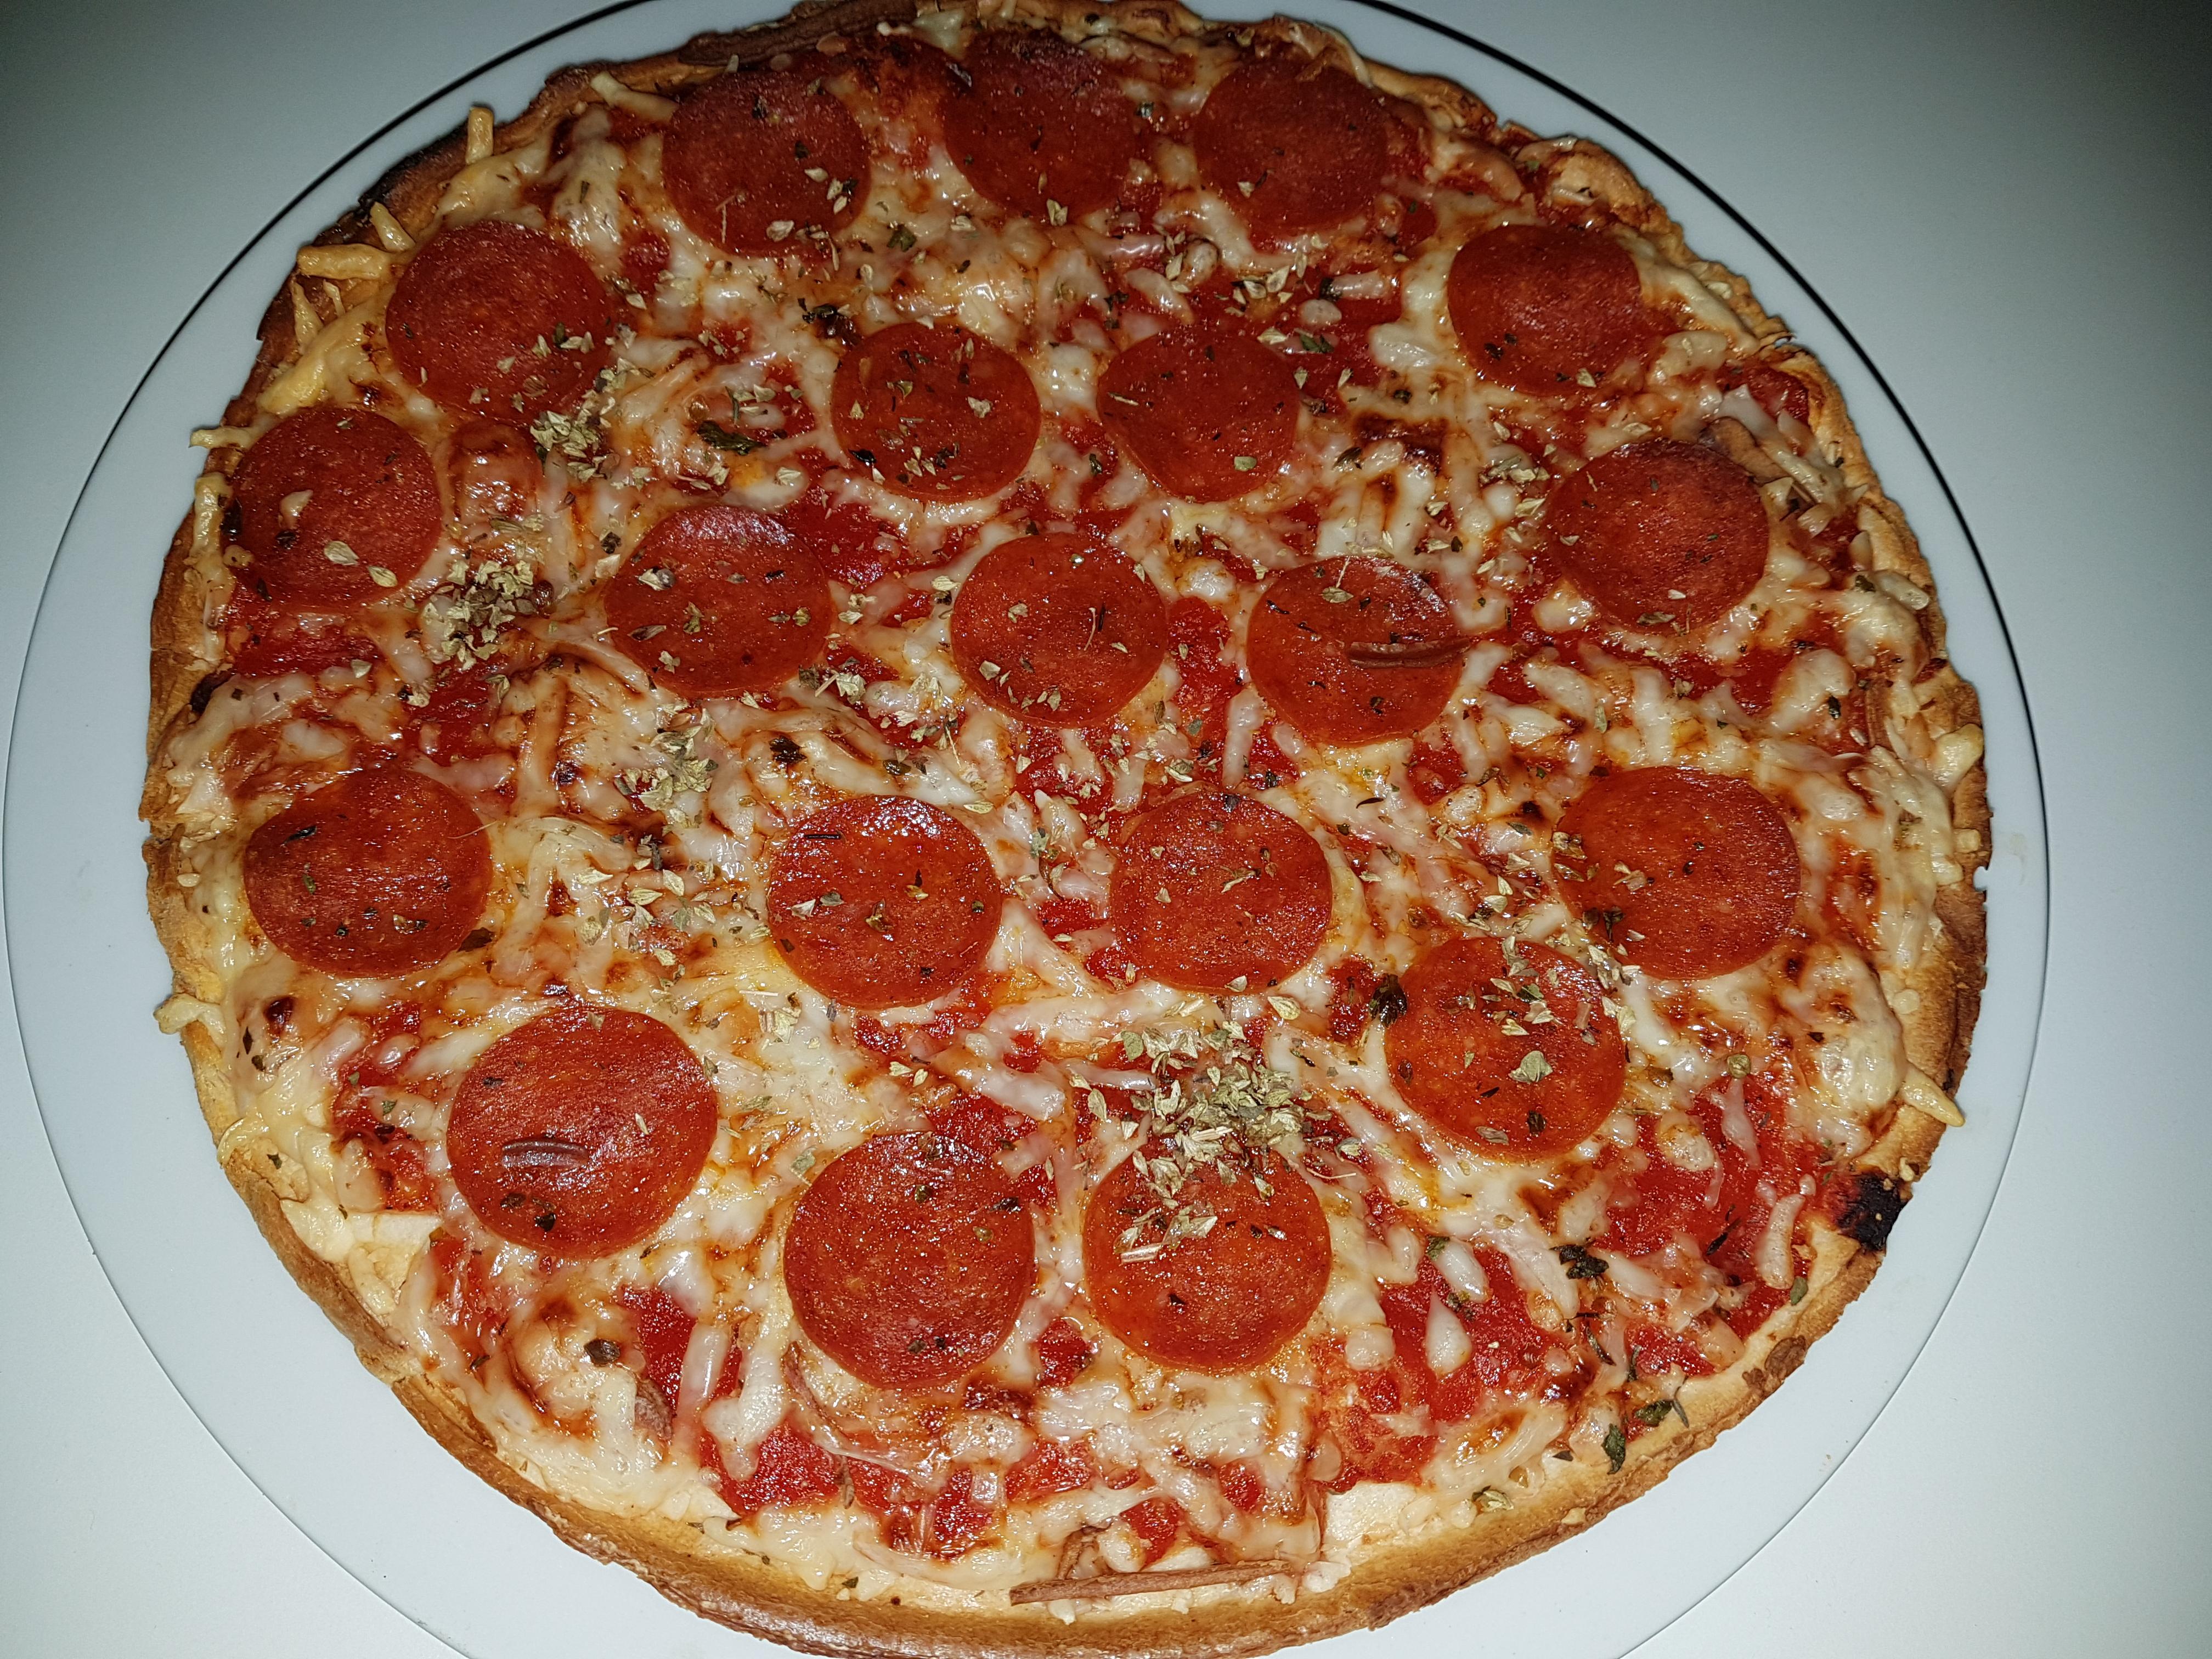 http://foodloader.net/Holz_2018-08-21_Pizza.jpg